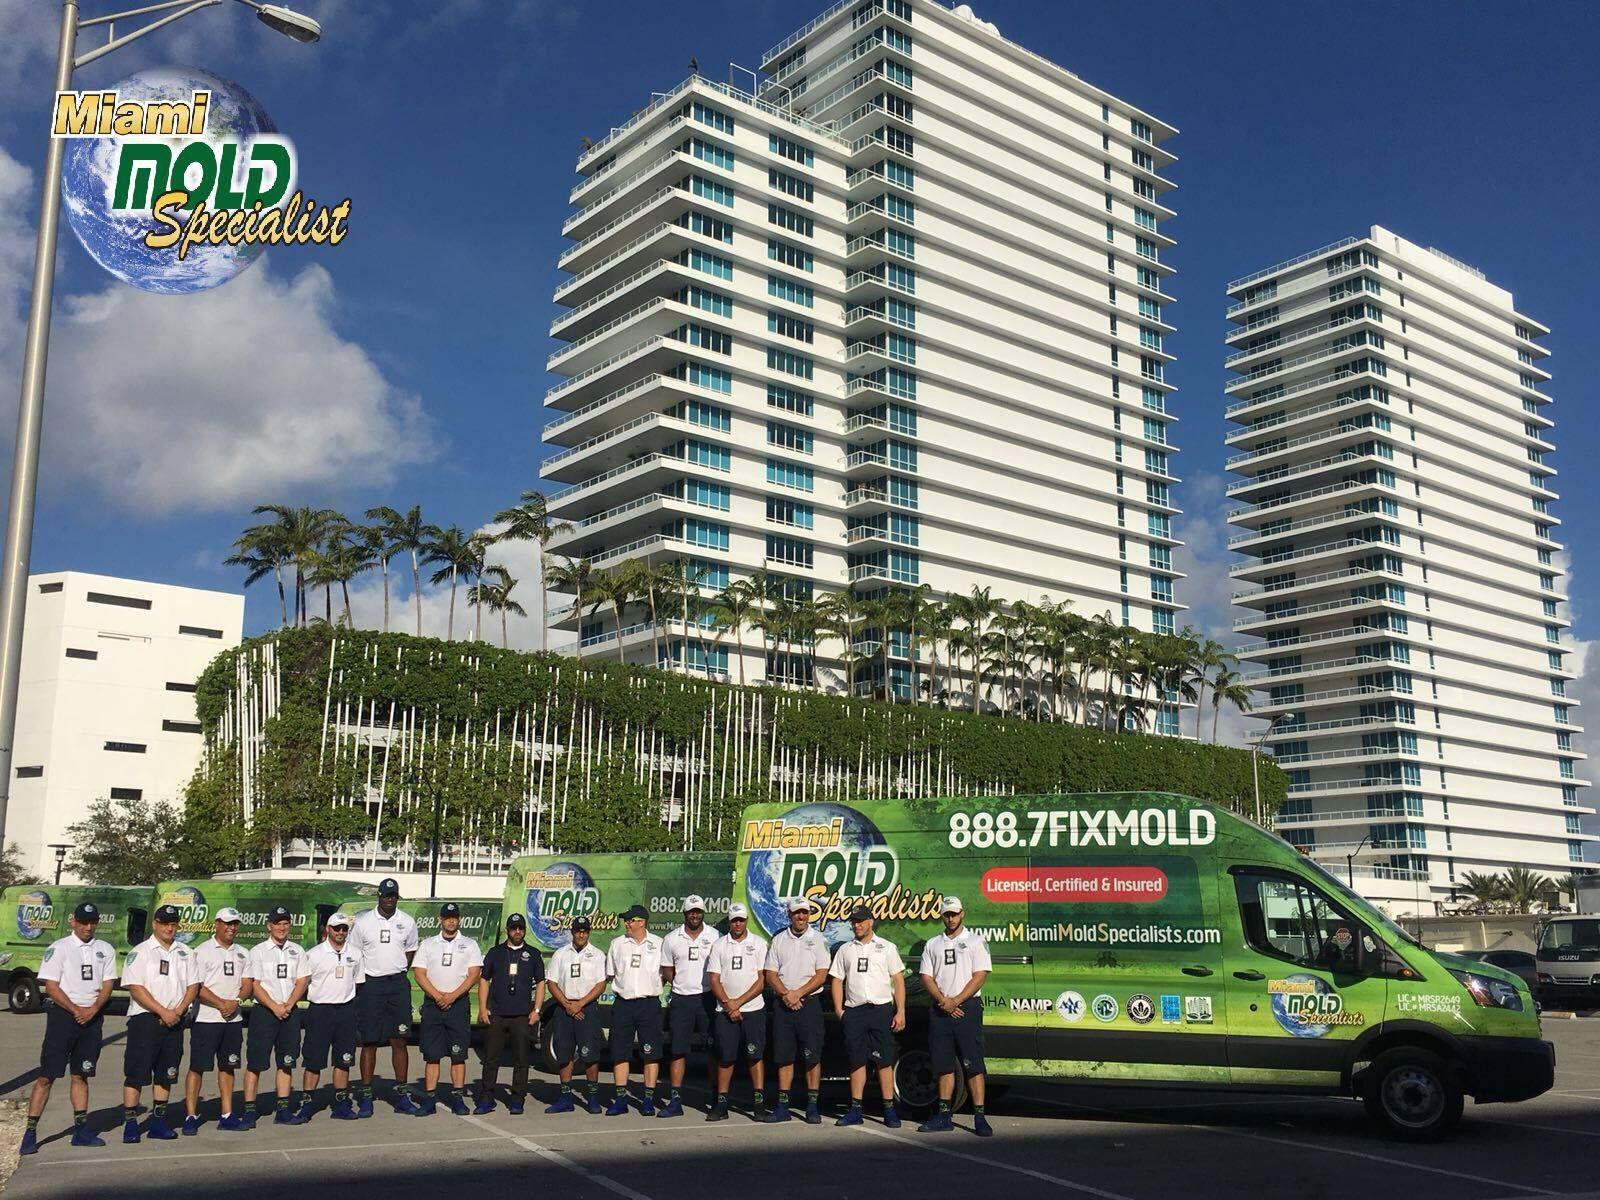 Miami Mold Specialists News Specialist, Florida, Miami